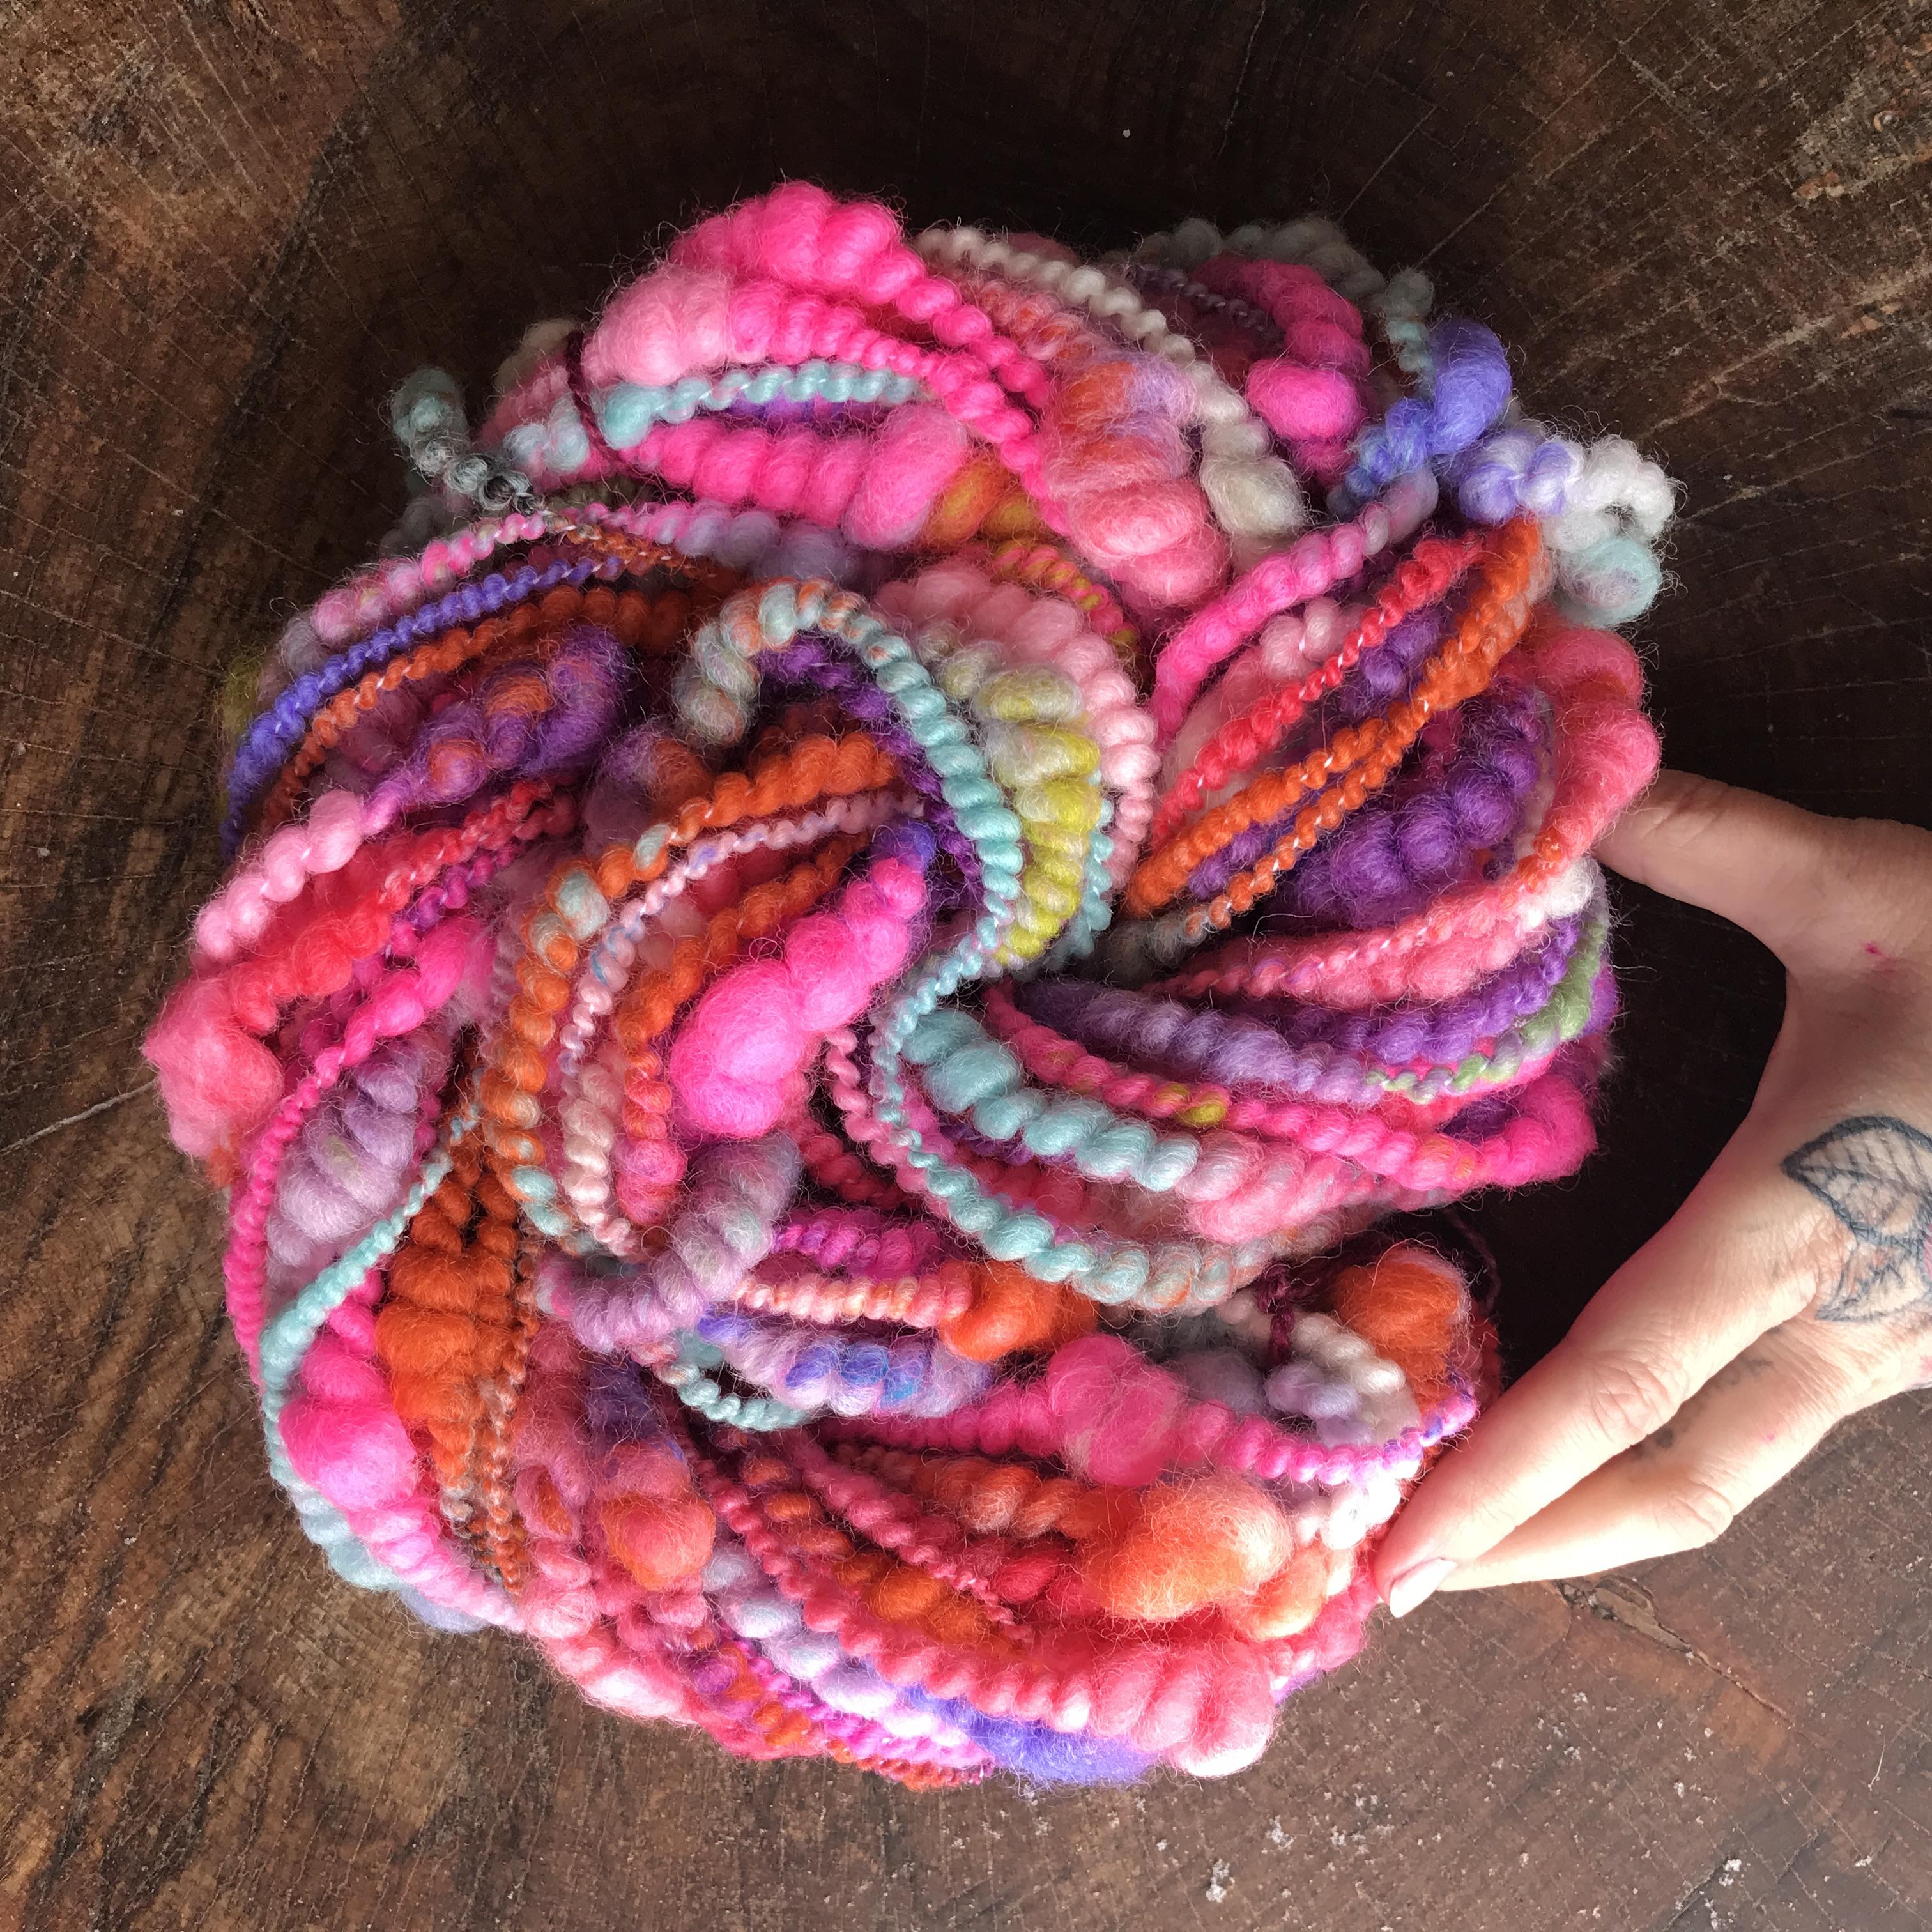 Simple method for spinning art yarn